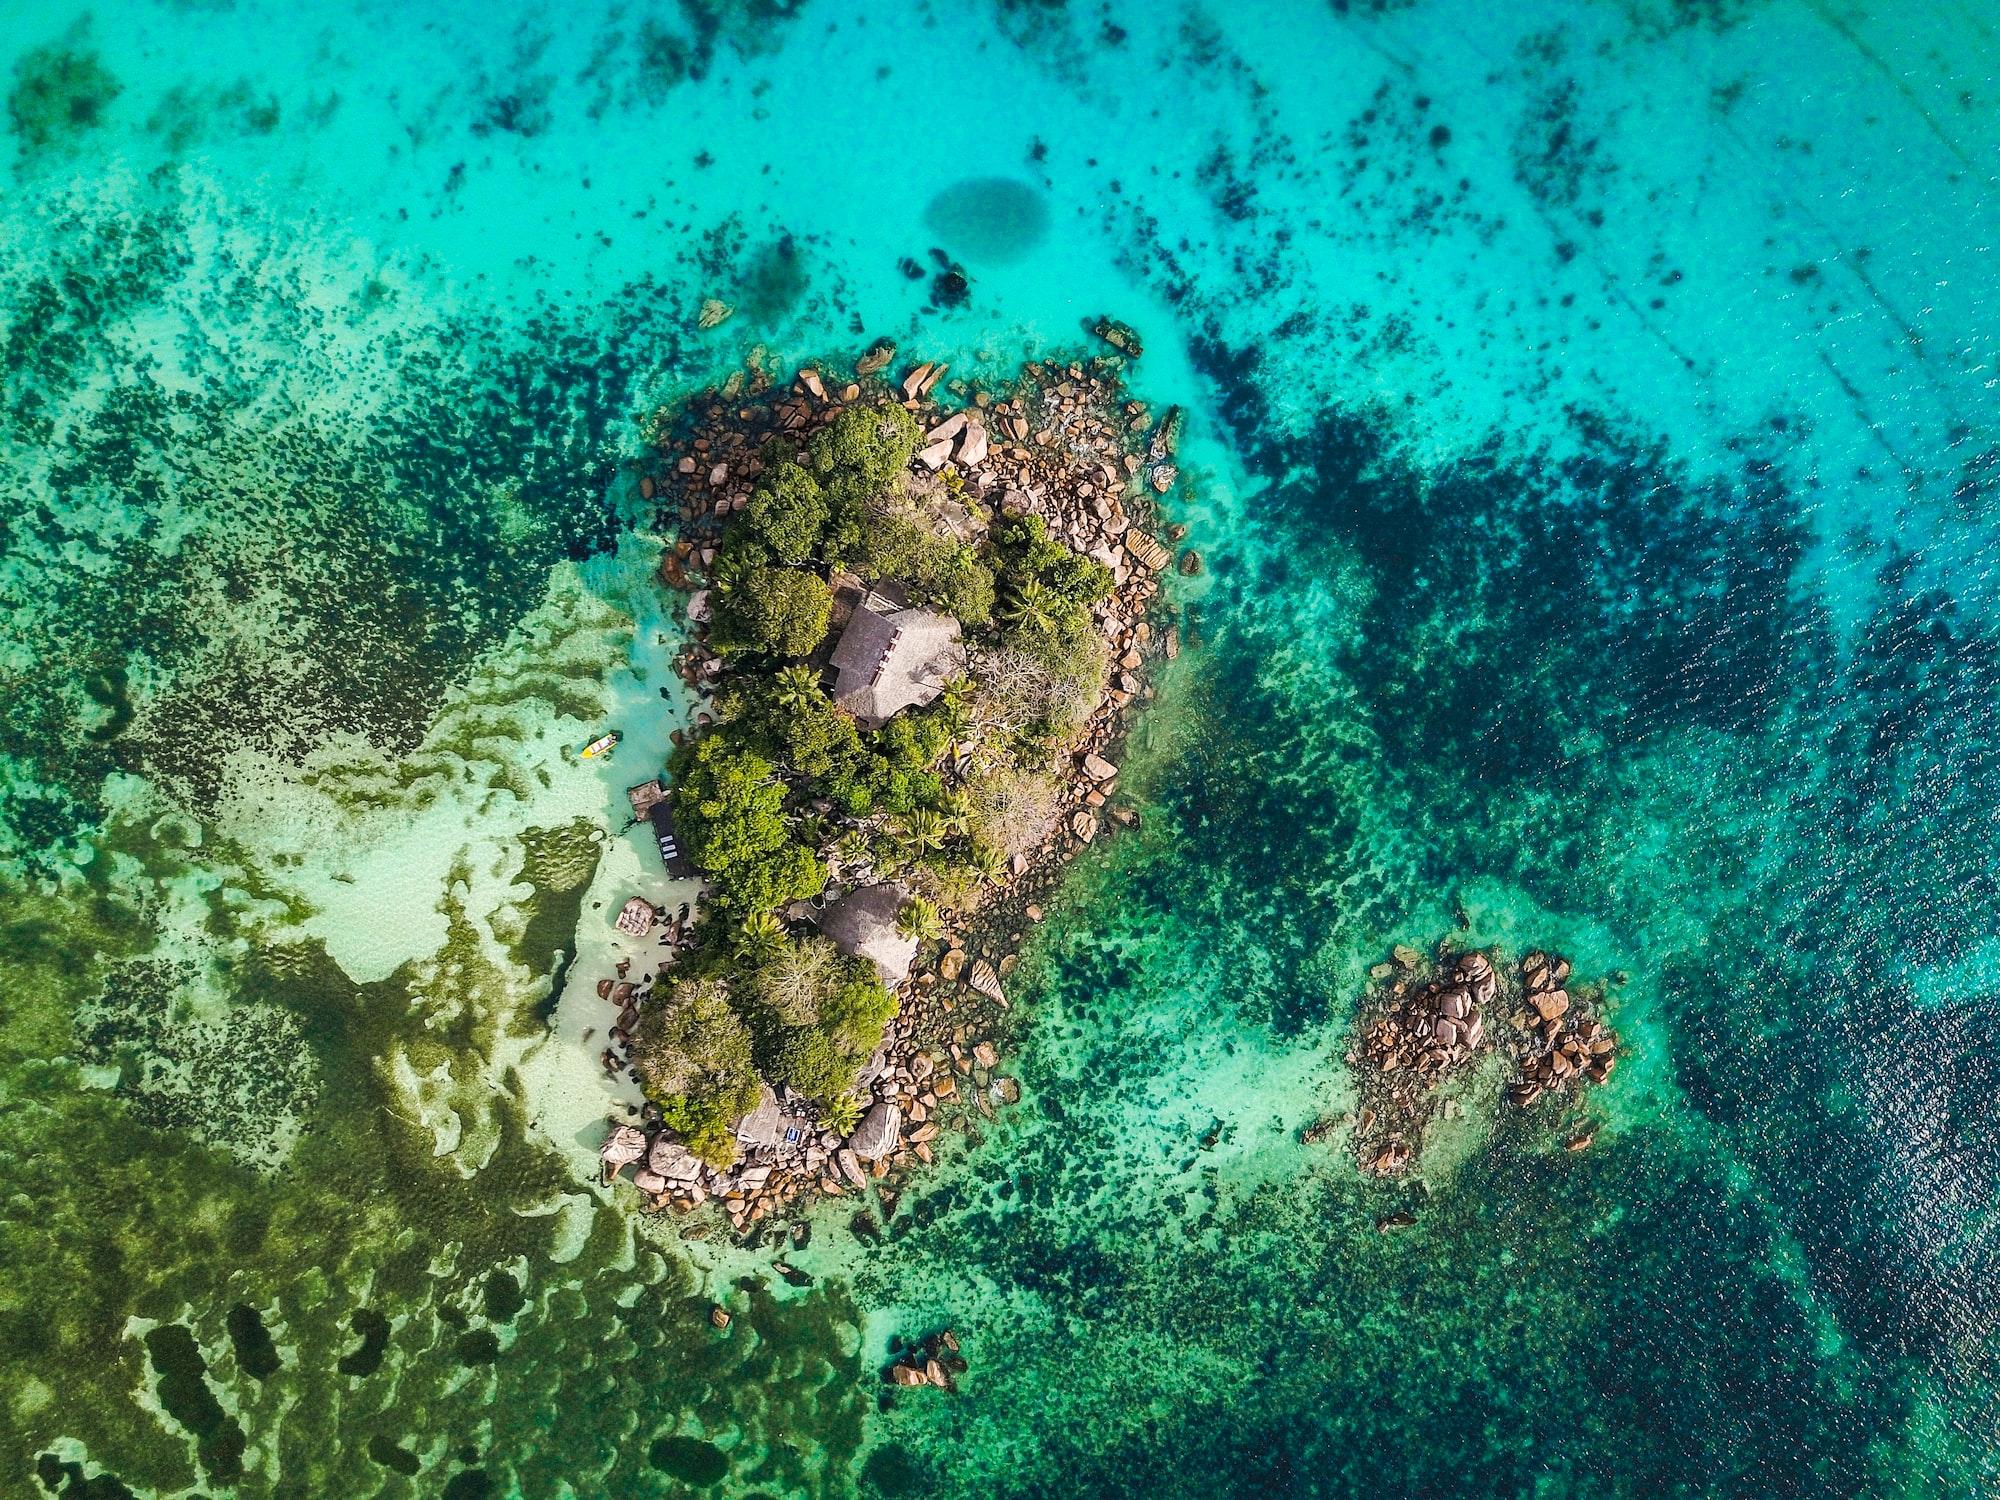 Shot in Seychelles - Praslin